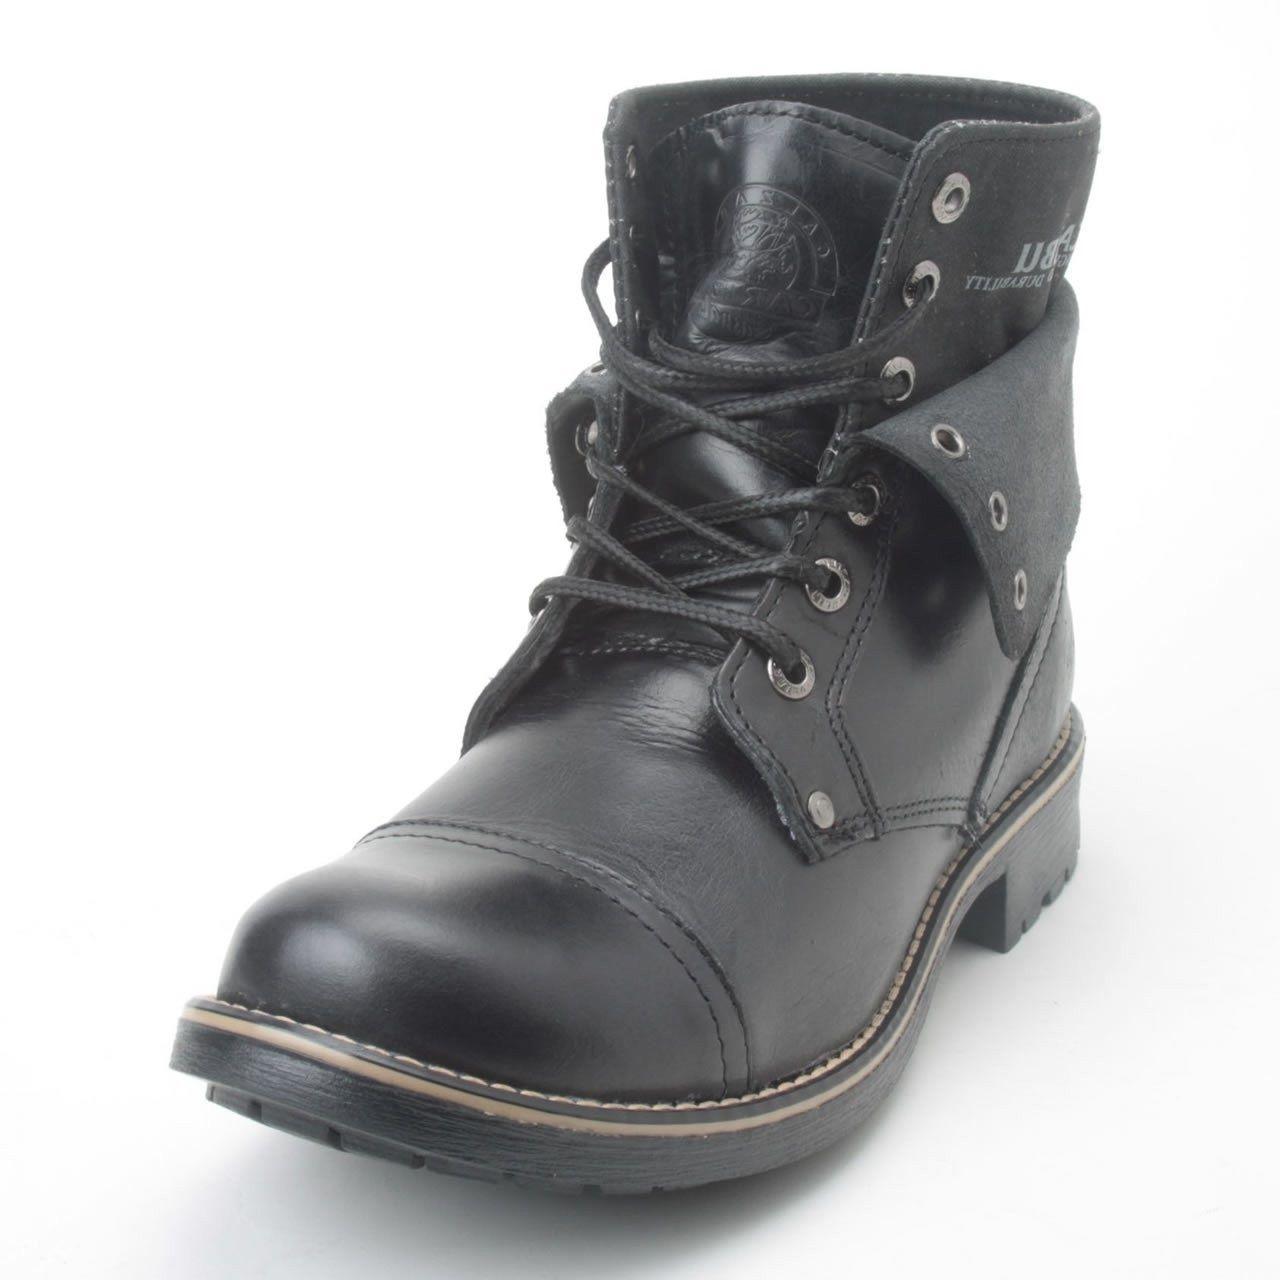 Bota Black Boots Bm 101 Castanho Compre Online Black